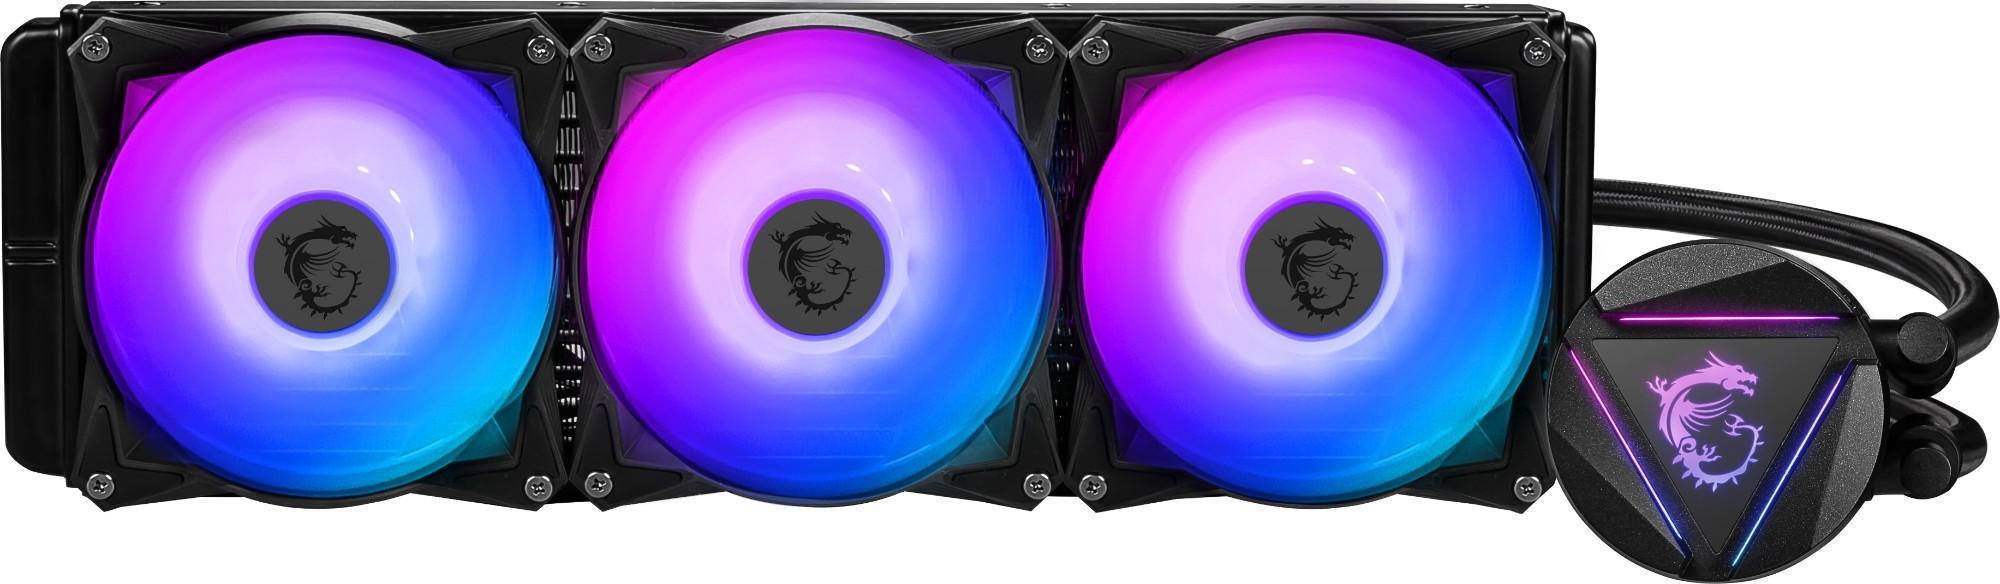 MSI MAG CORELIQUID 360R CPU AIO Cooler ' 360mm Radiator, 3x 120mm ARGB PWM Fan, Adjustable ARGB Dragon CPU Mount, Compatible with Intel and AMD Platforms'